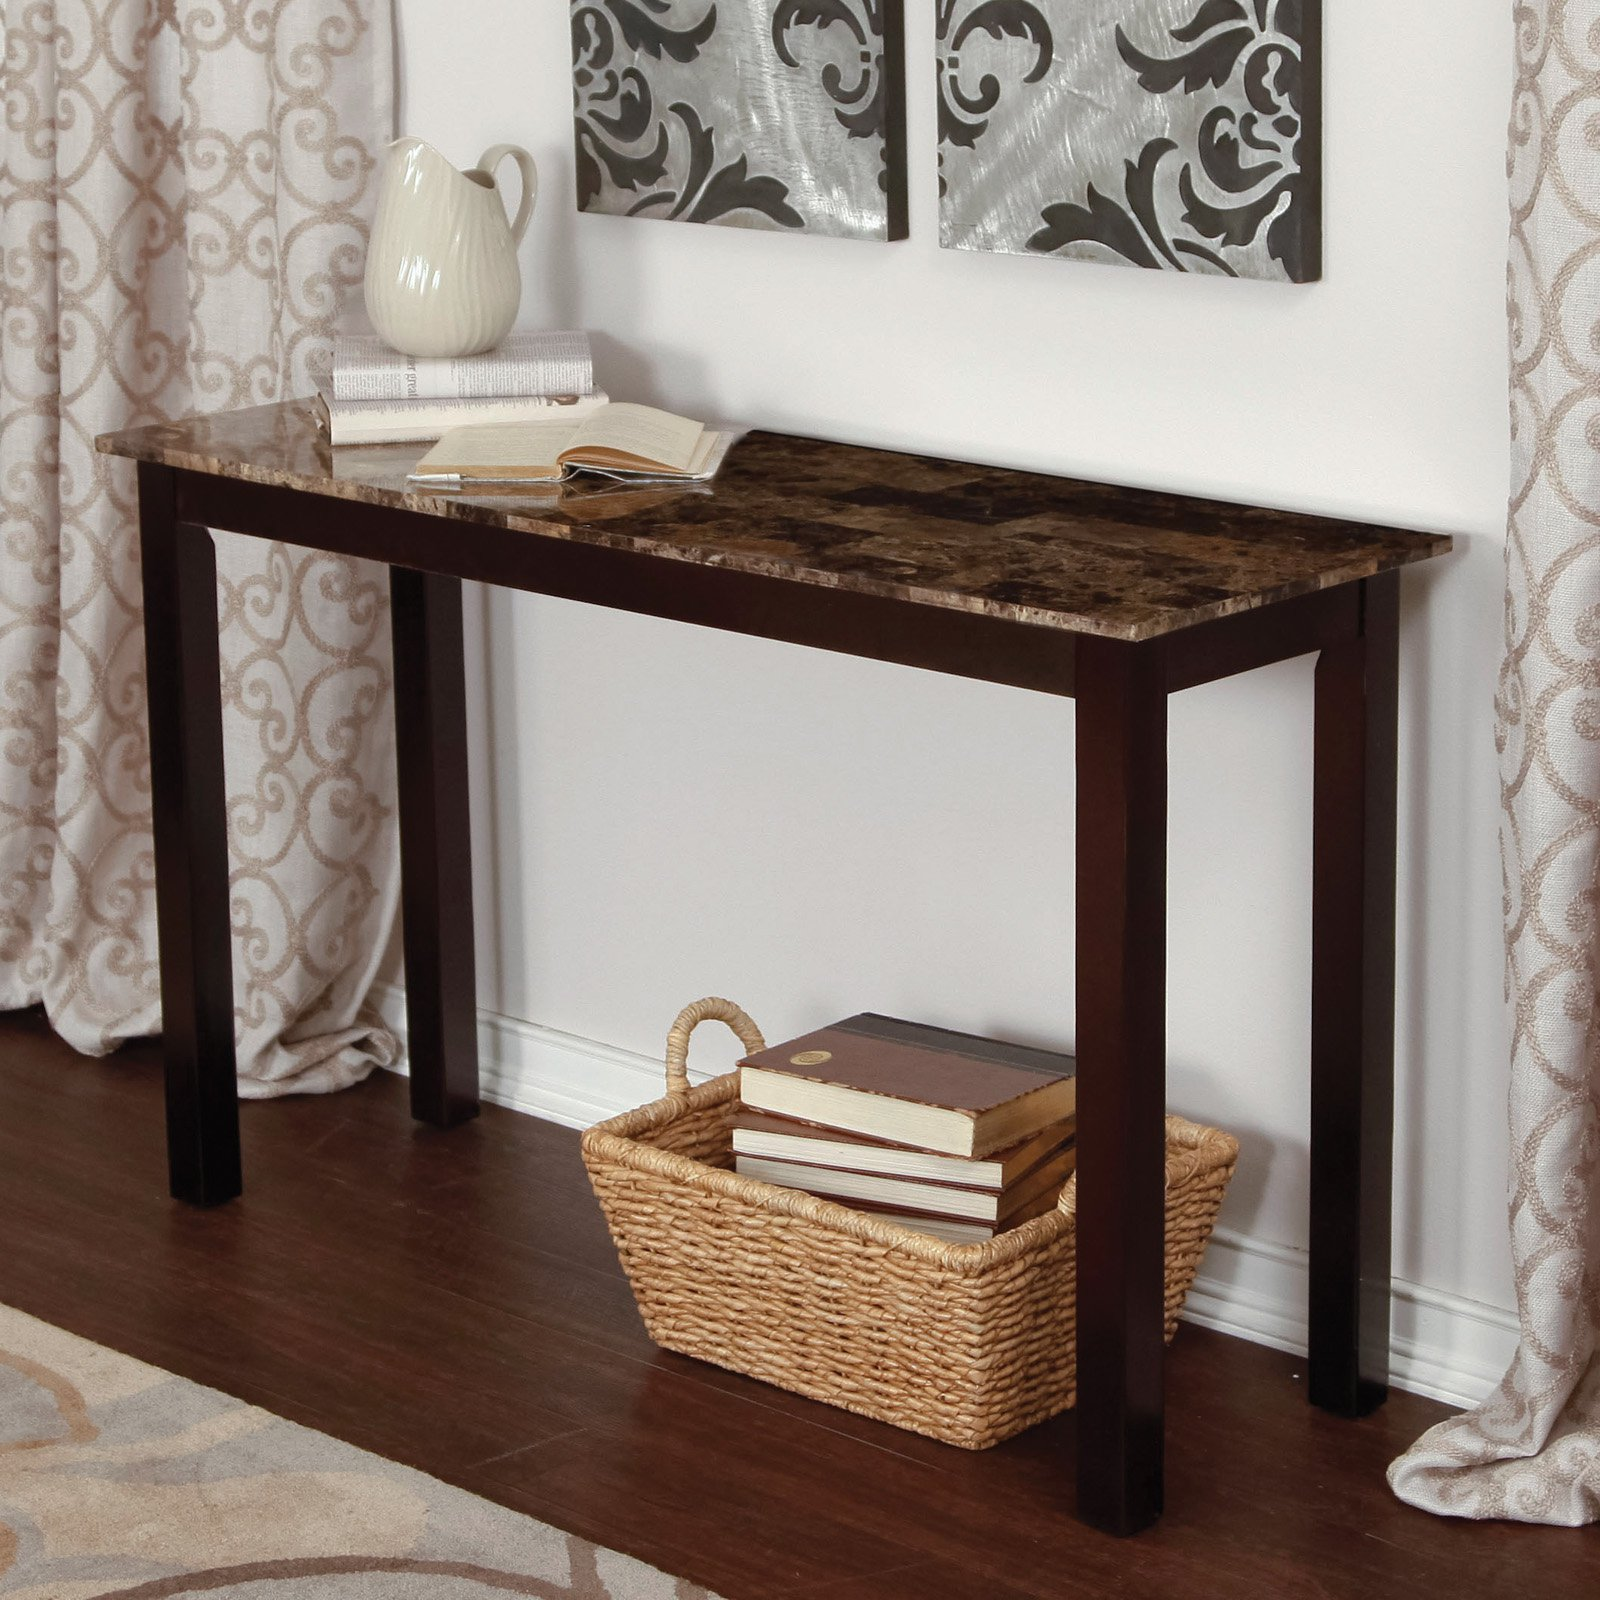 Attractive Palazzo Faux Marble Console Table   Walmart.com